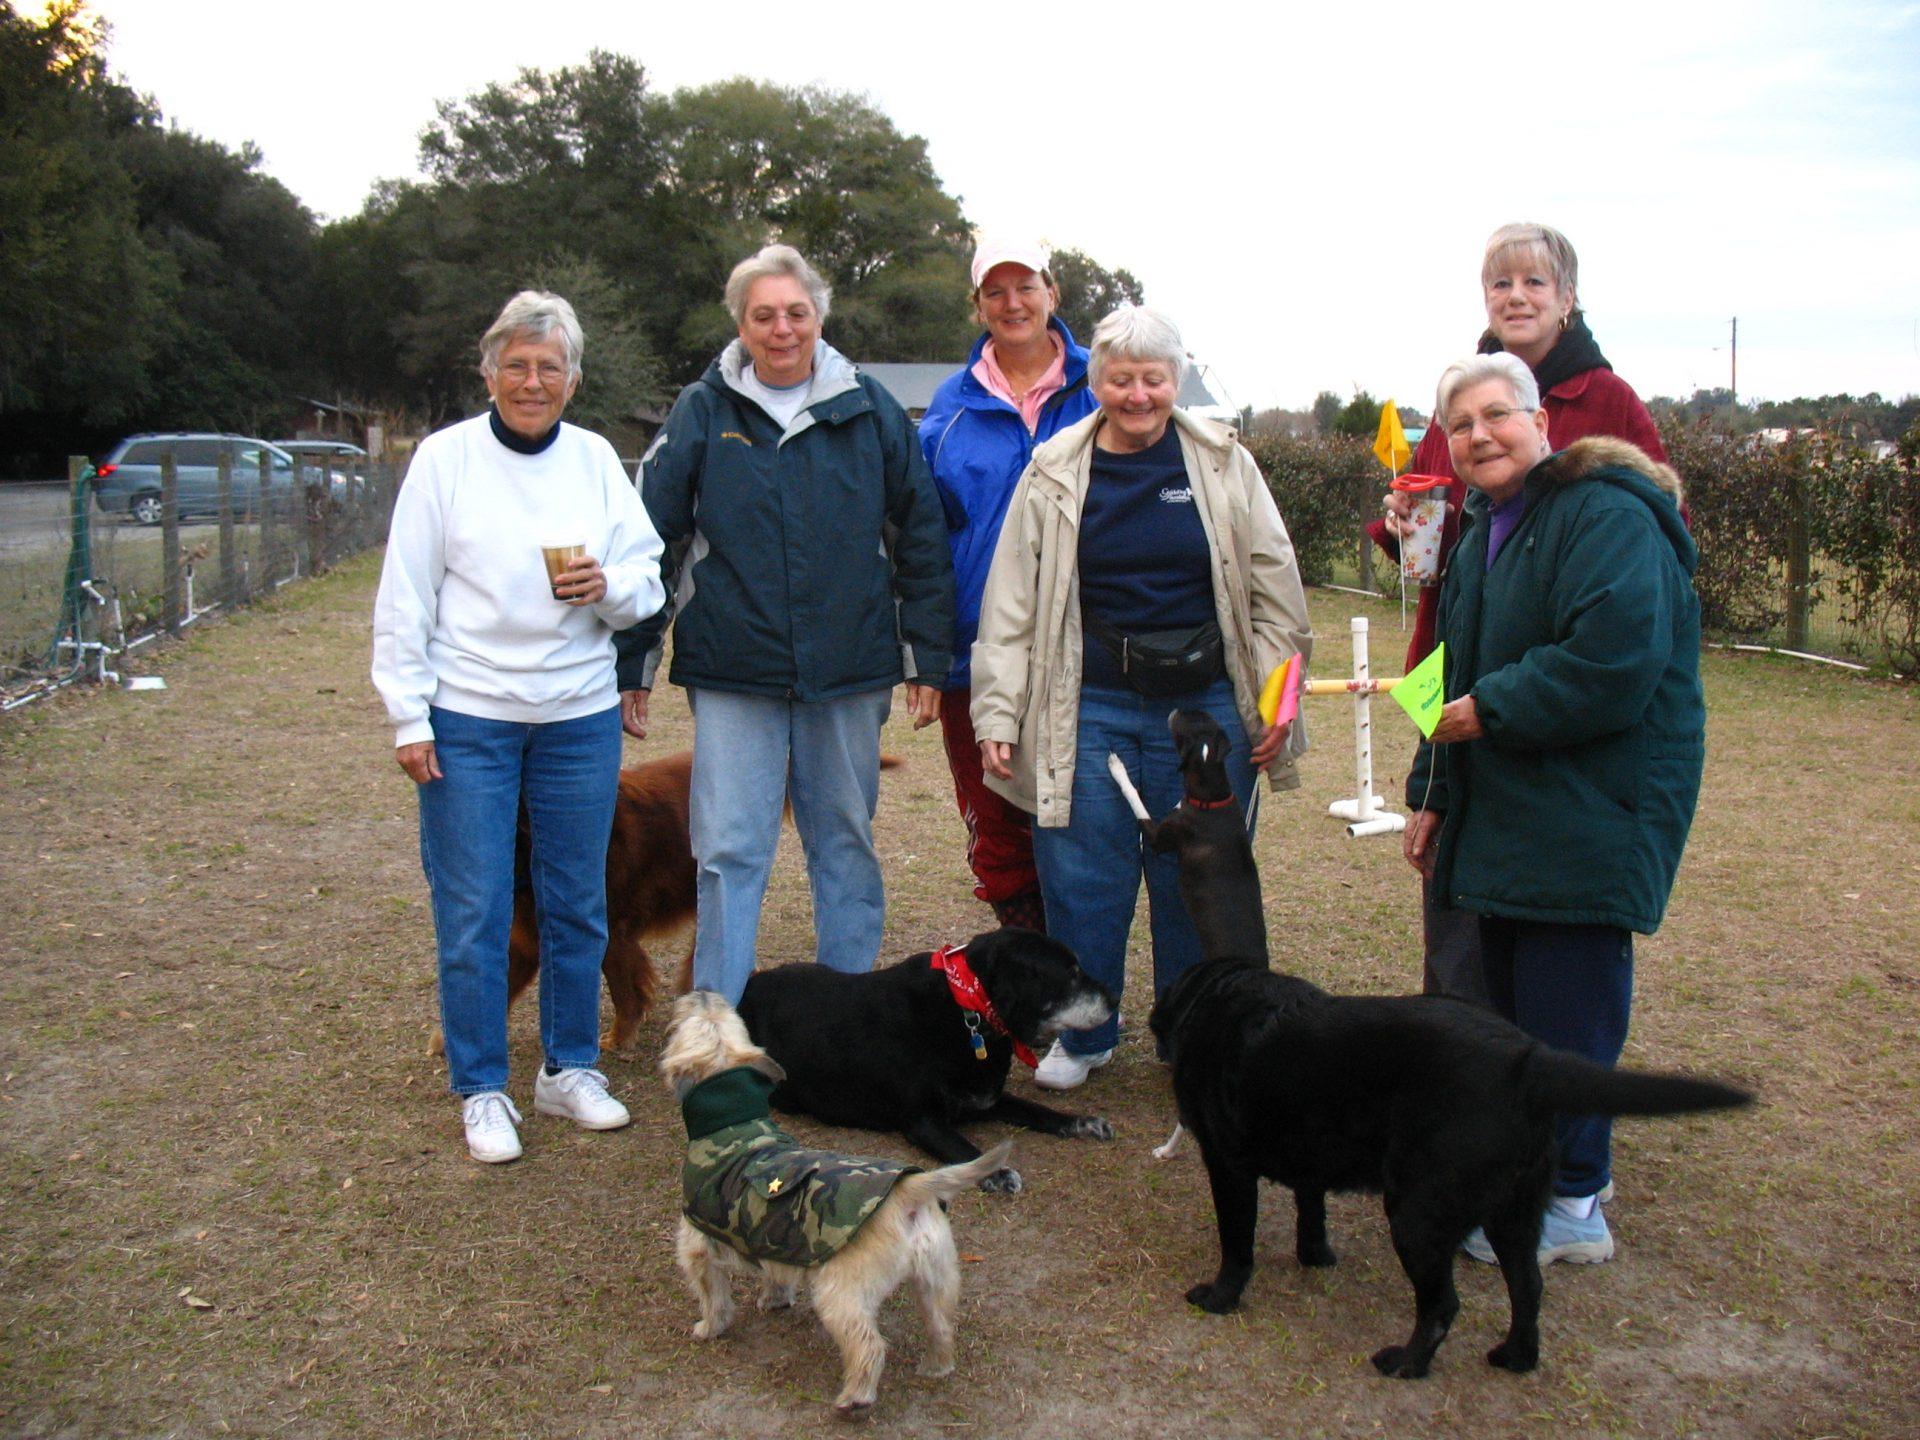 Morning gathering at Doggie Do Run Run with friends. Around 2006